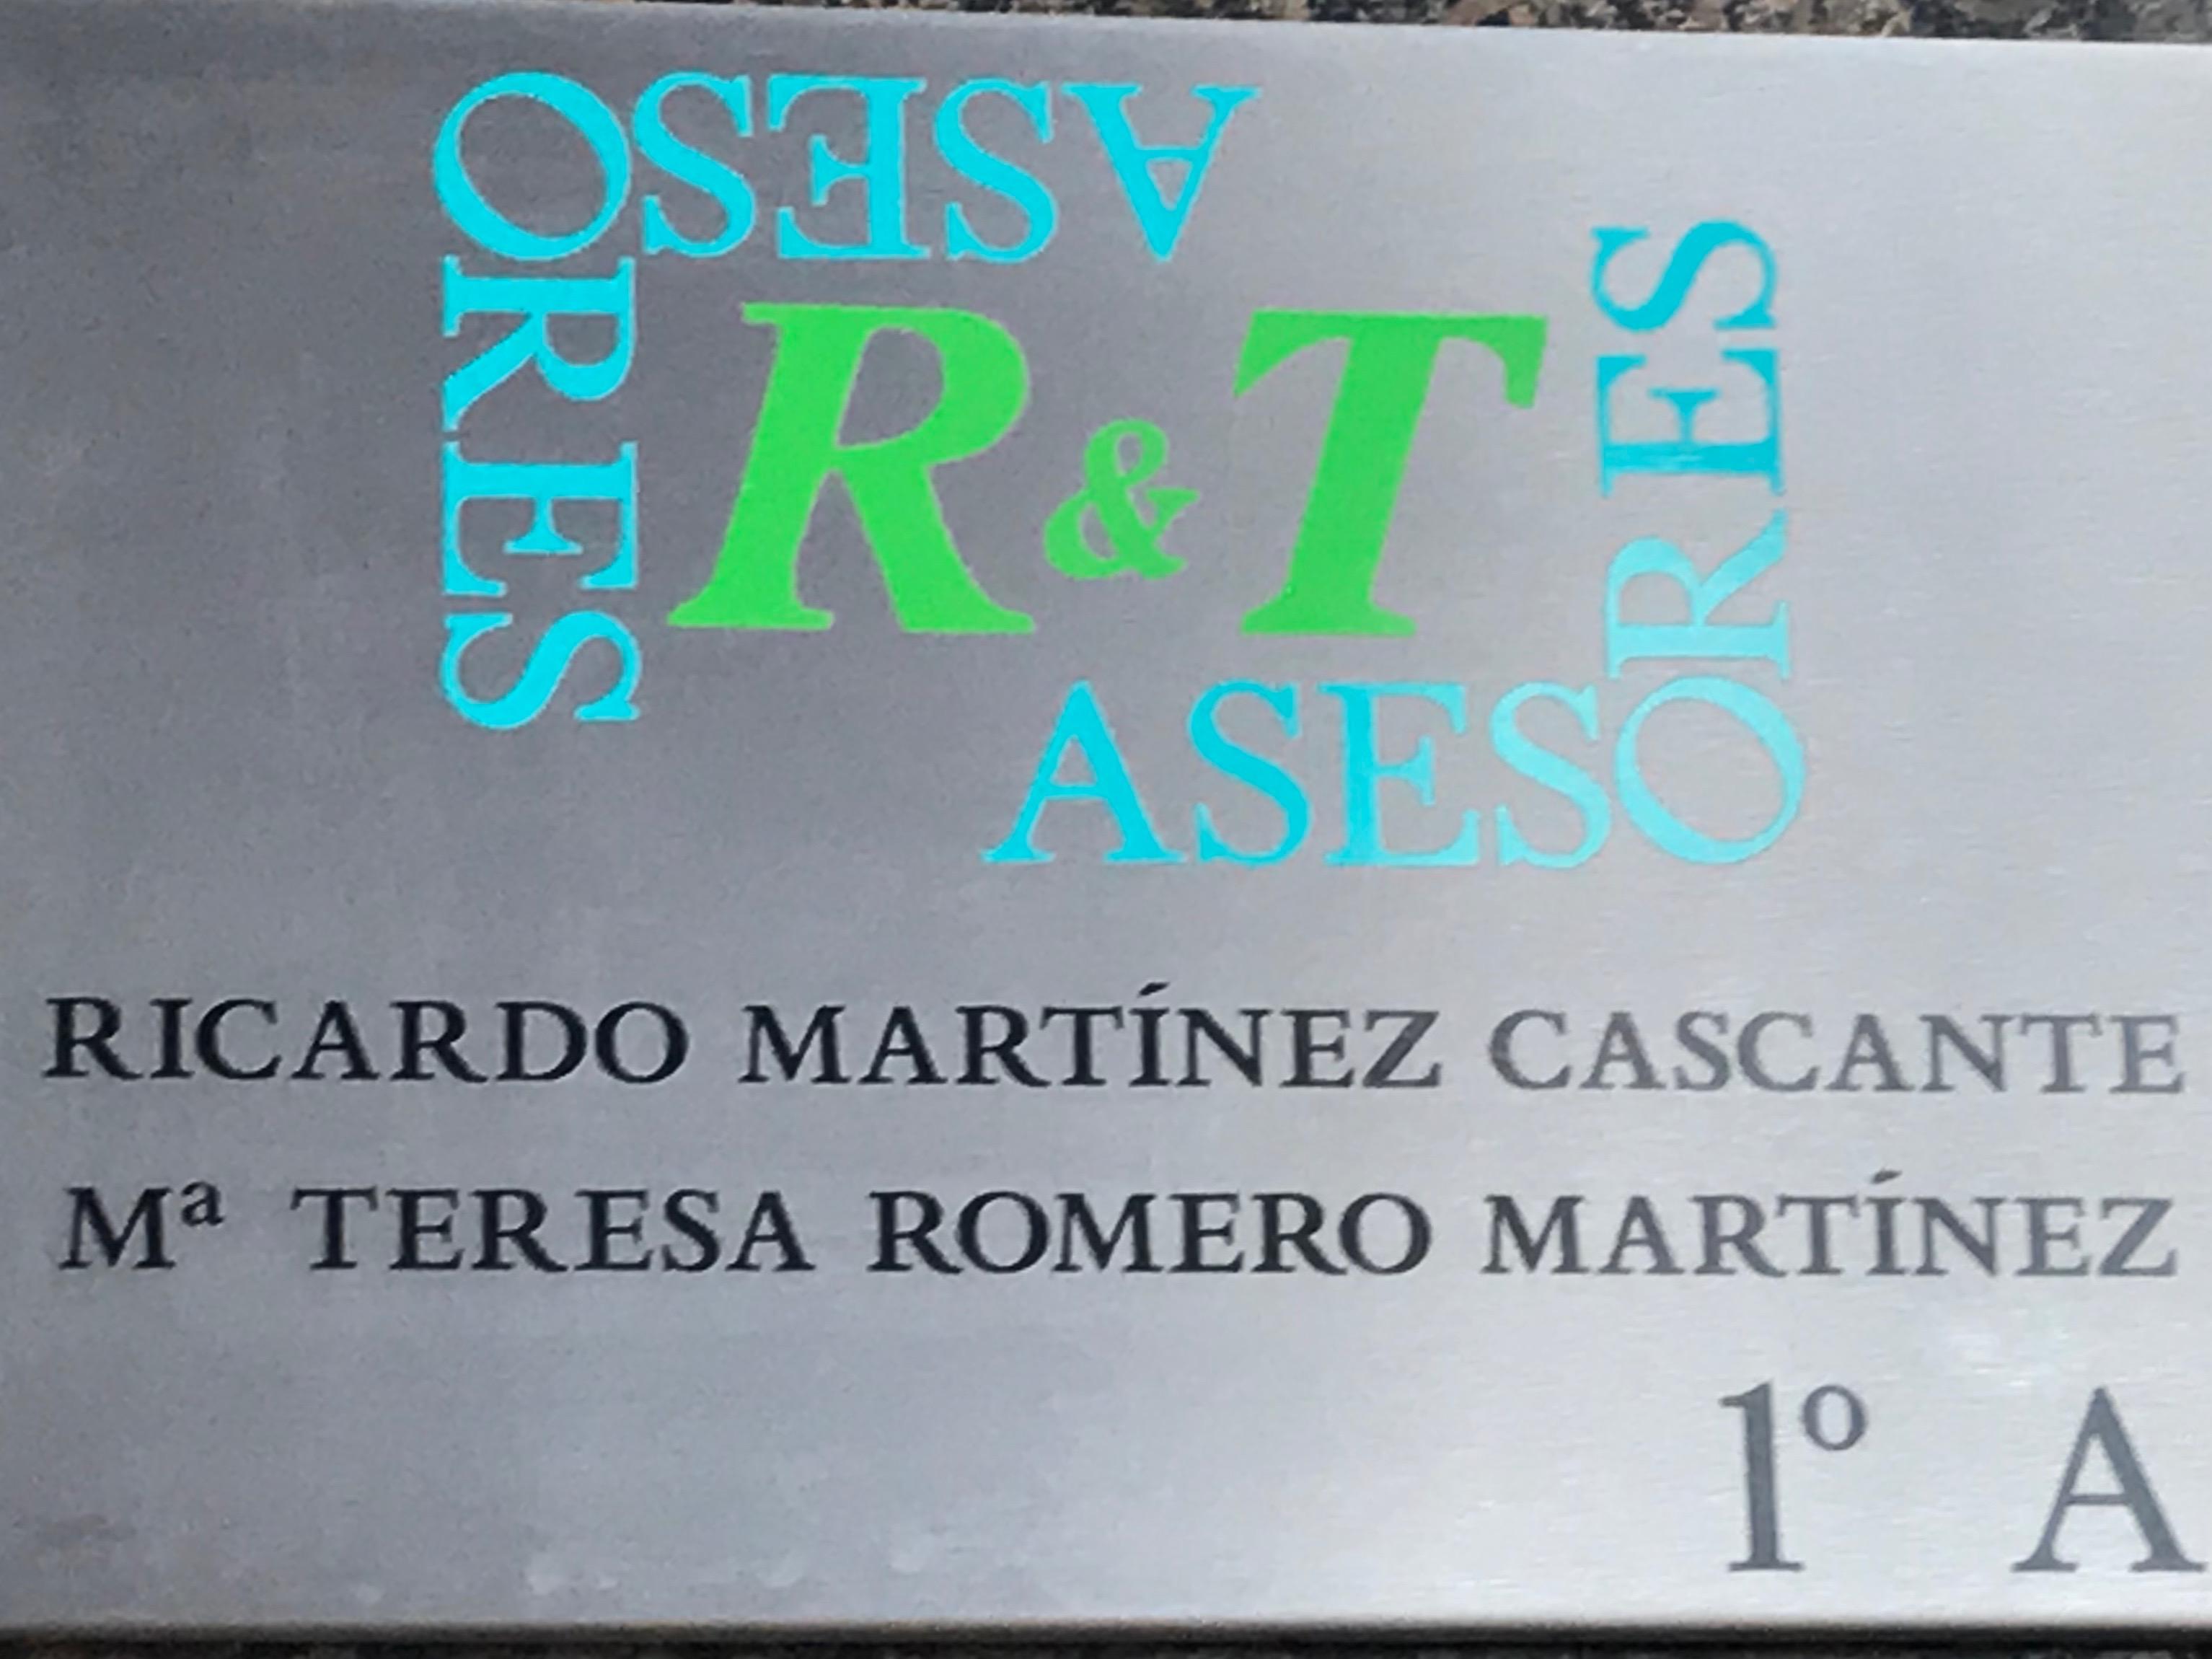 R & T Asesores Logroño